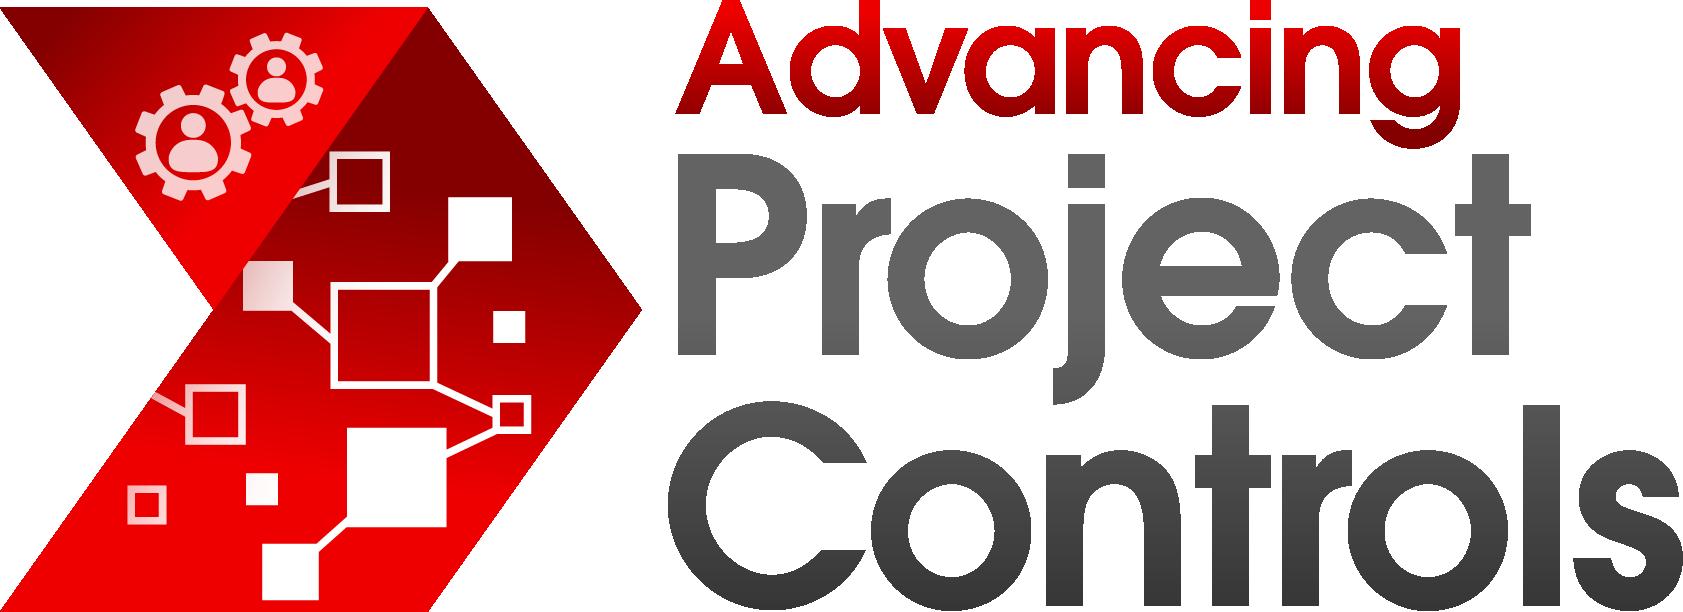 Advancing-Project-Controls-2019-logo-NO-DATE-1